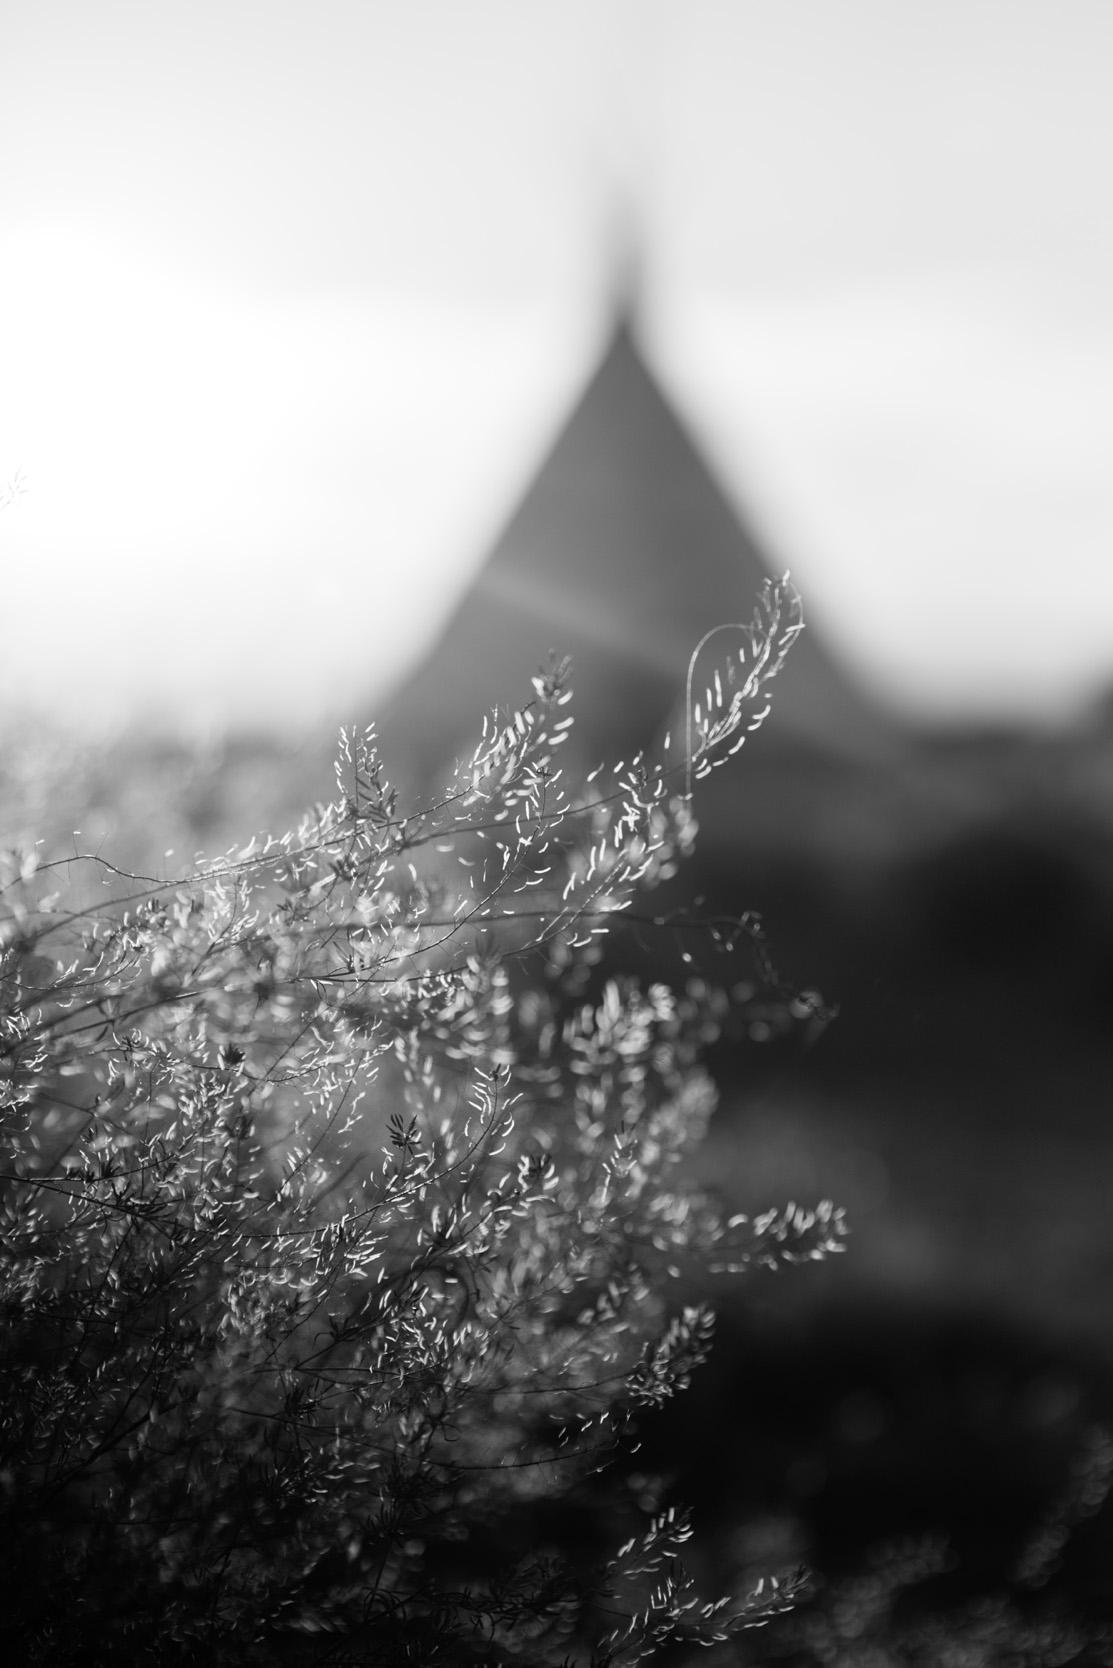 Britt_Nemeth_Studios_PhotographyNature_Spaces_Places_Vaction_Travel012.jpg